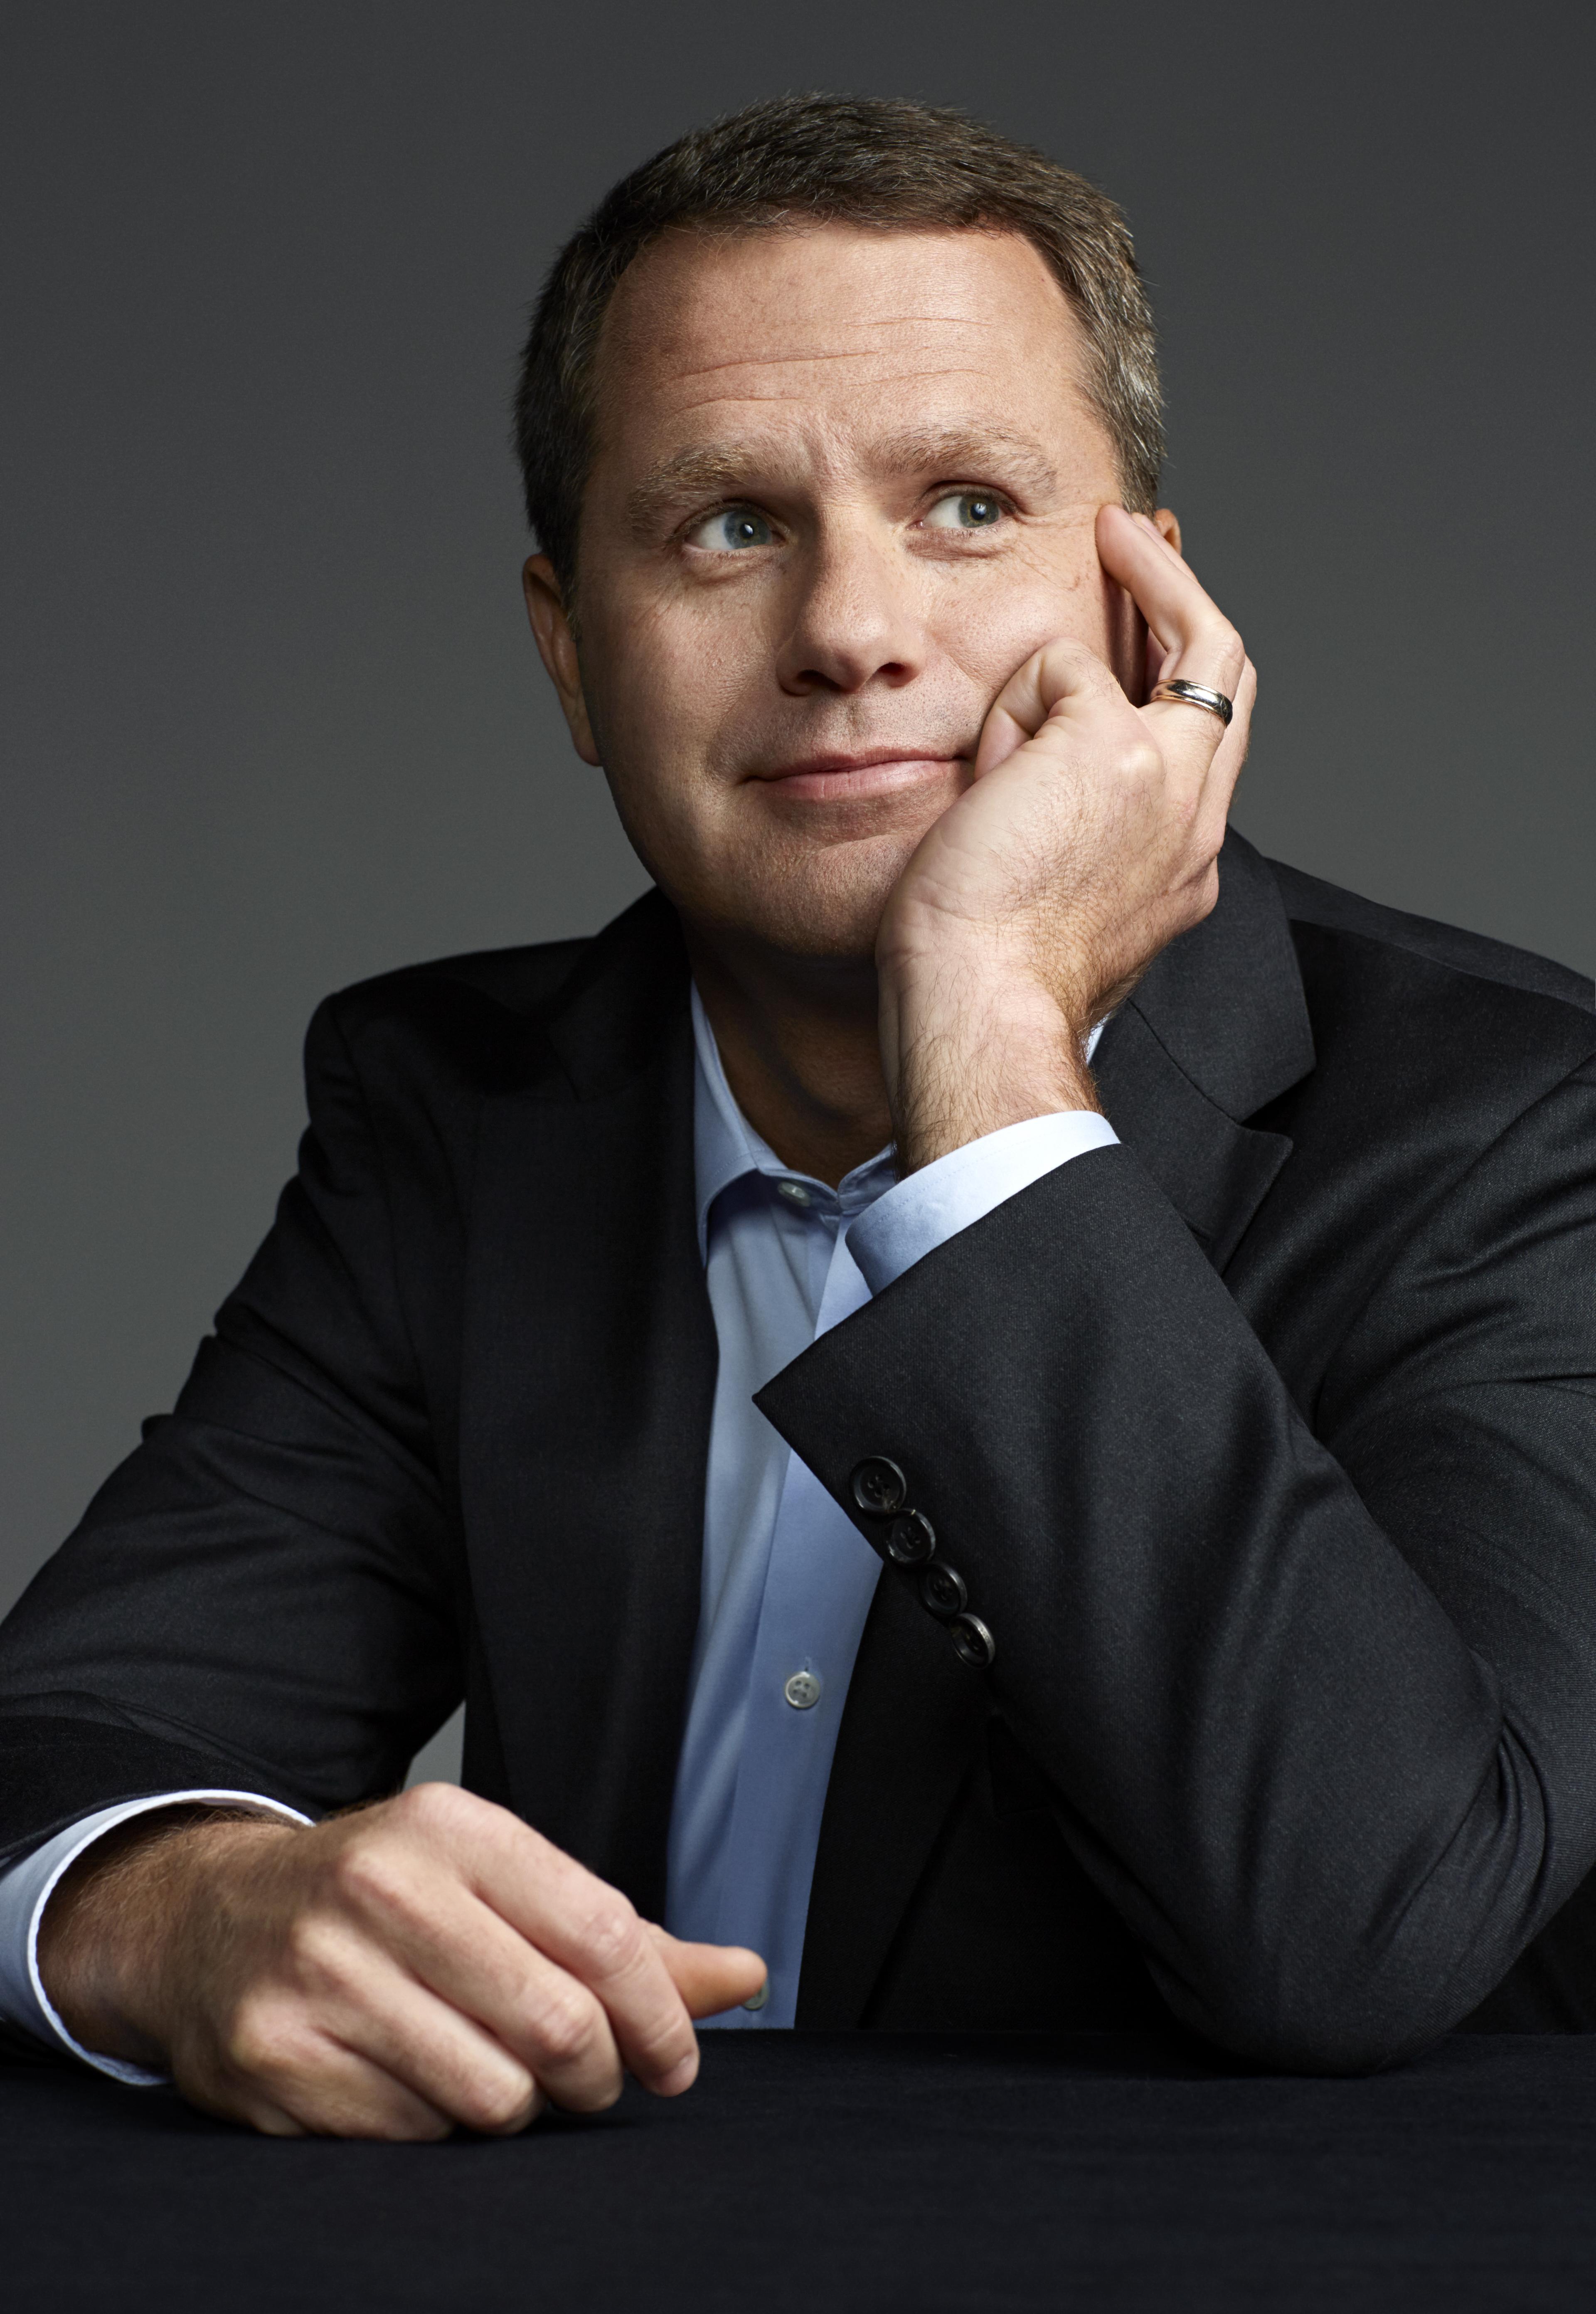 Walmart CEO Doug McMillon